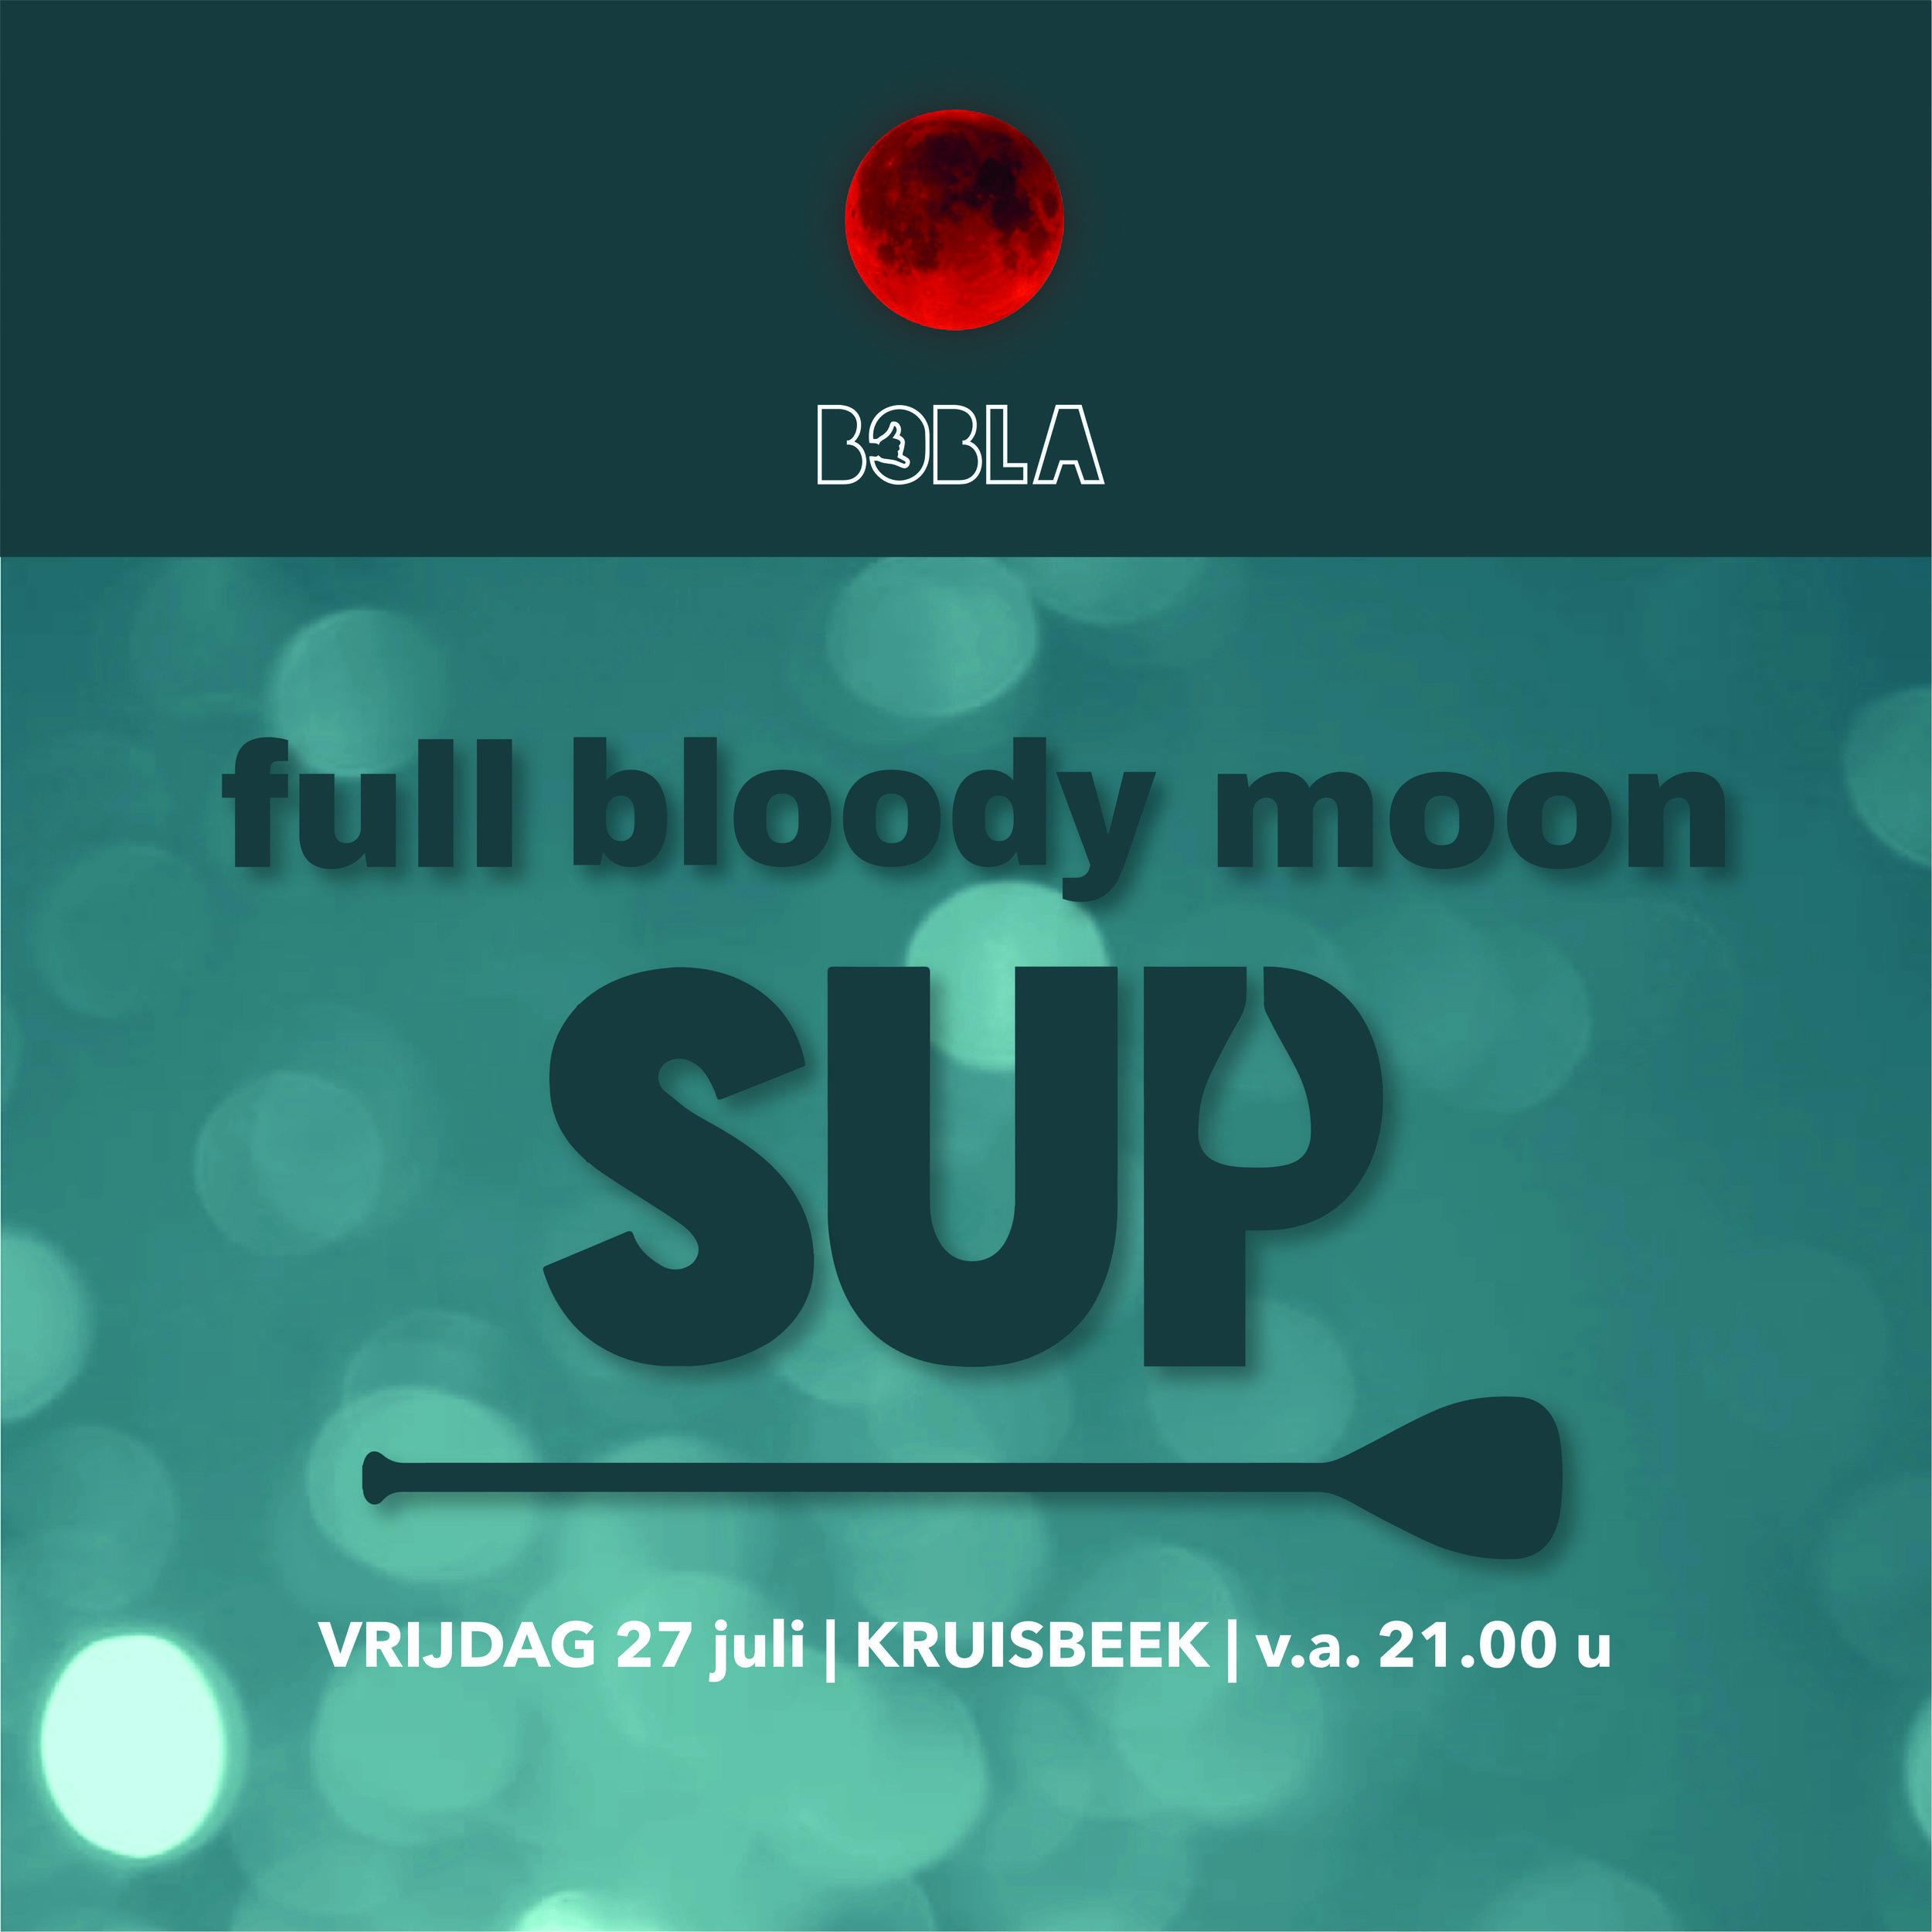 Bobla_Full_Bloody_Moon_SUP_27juli2018.jpg